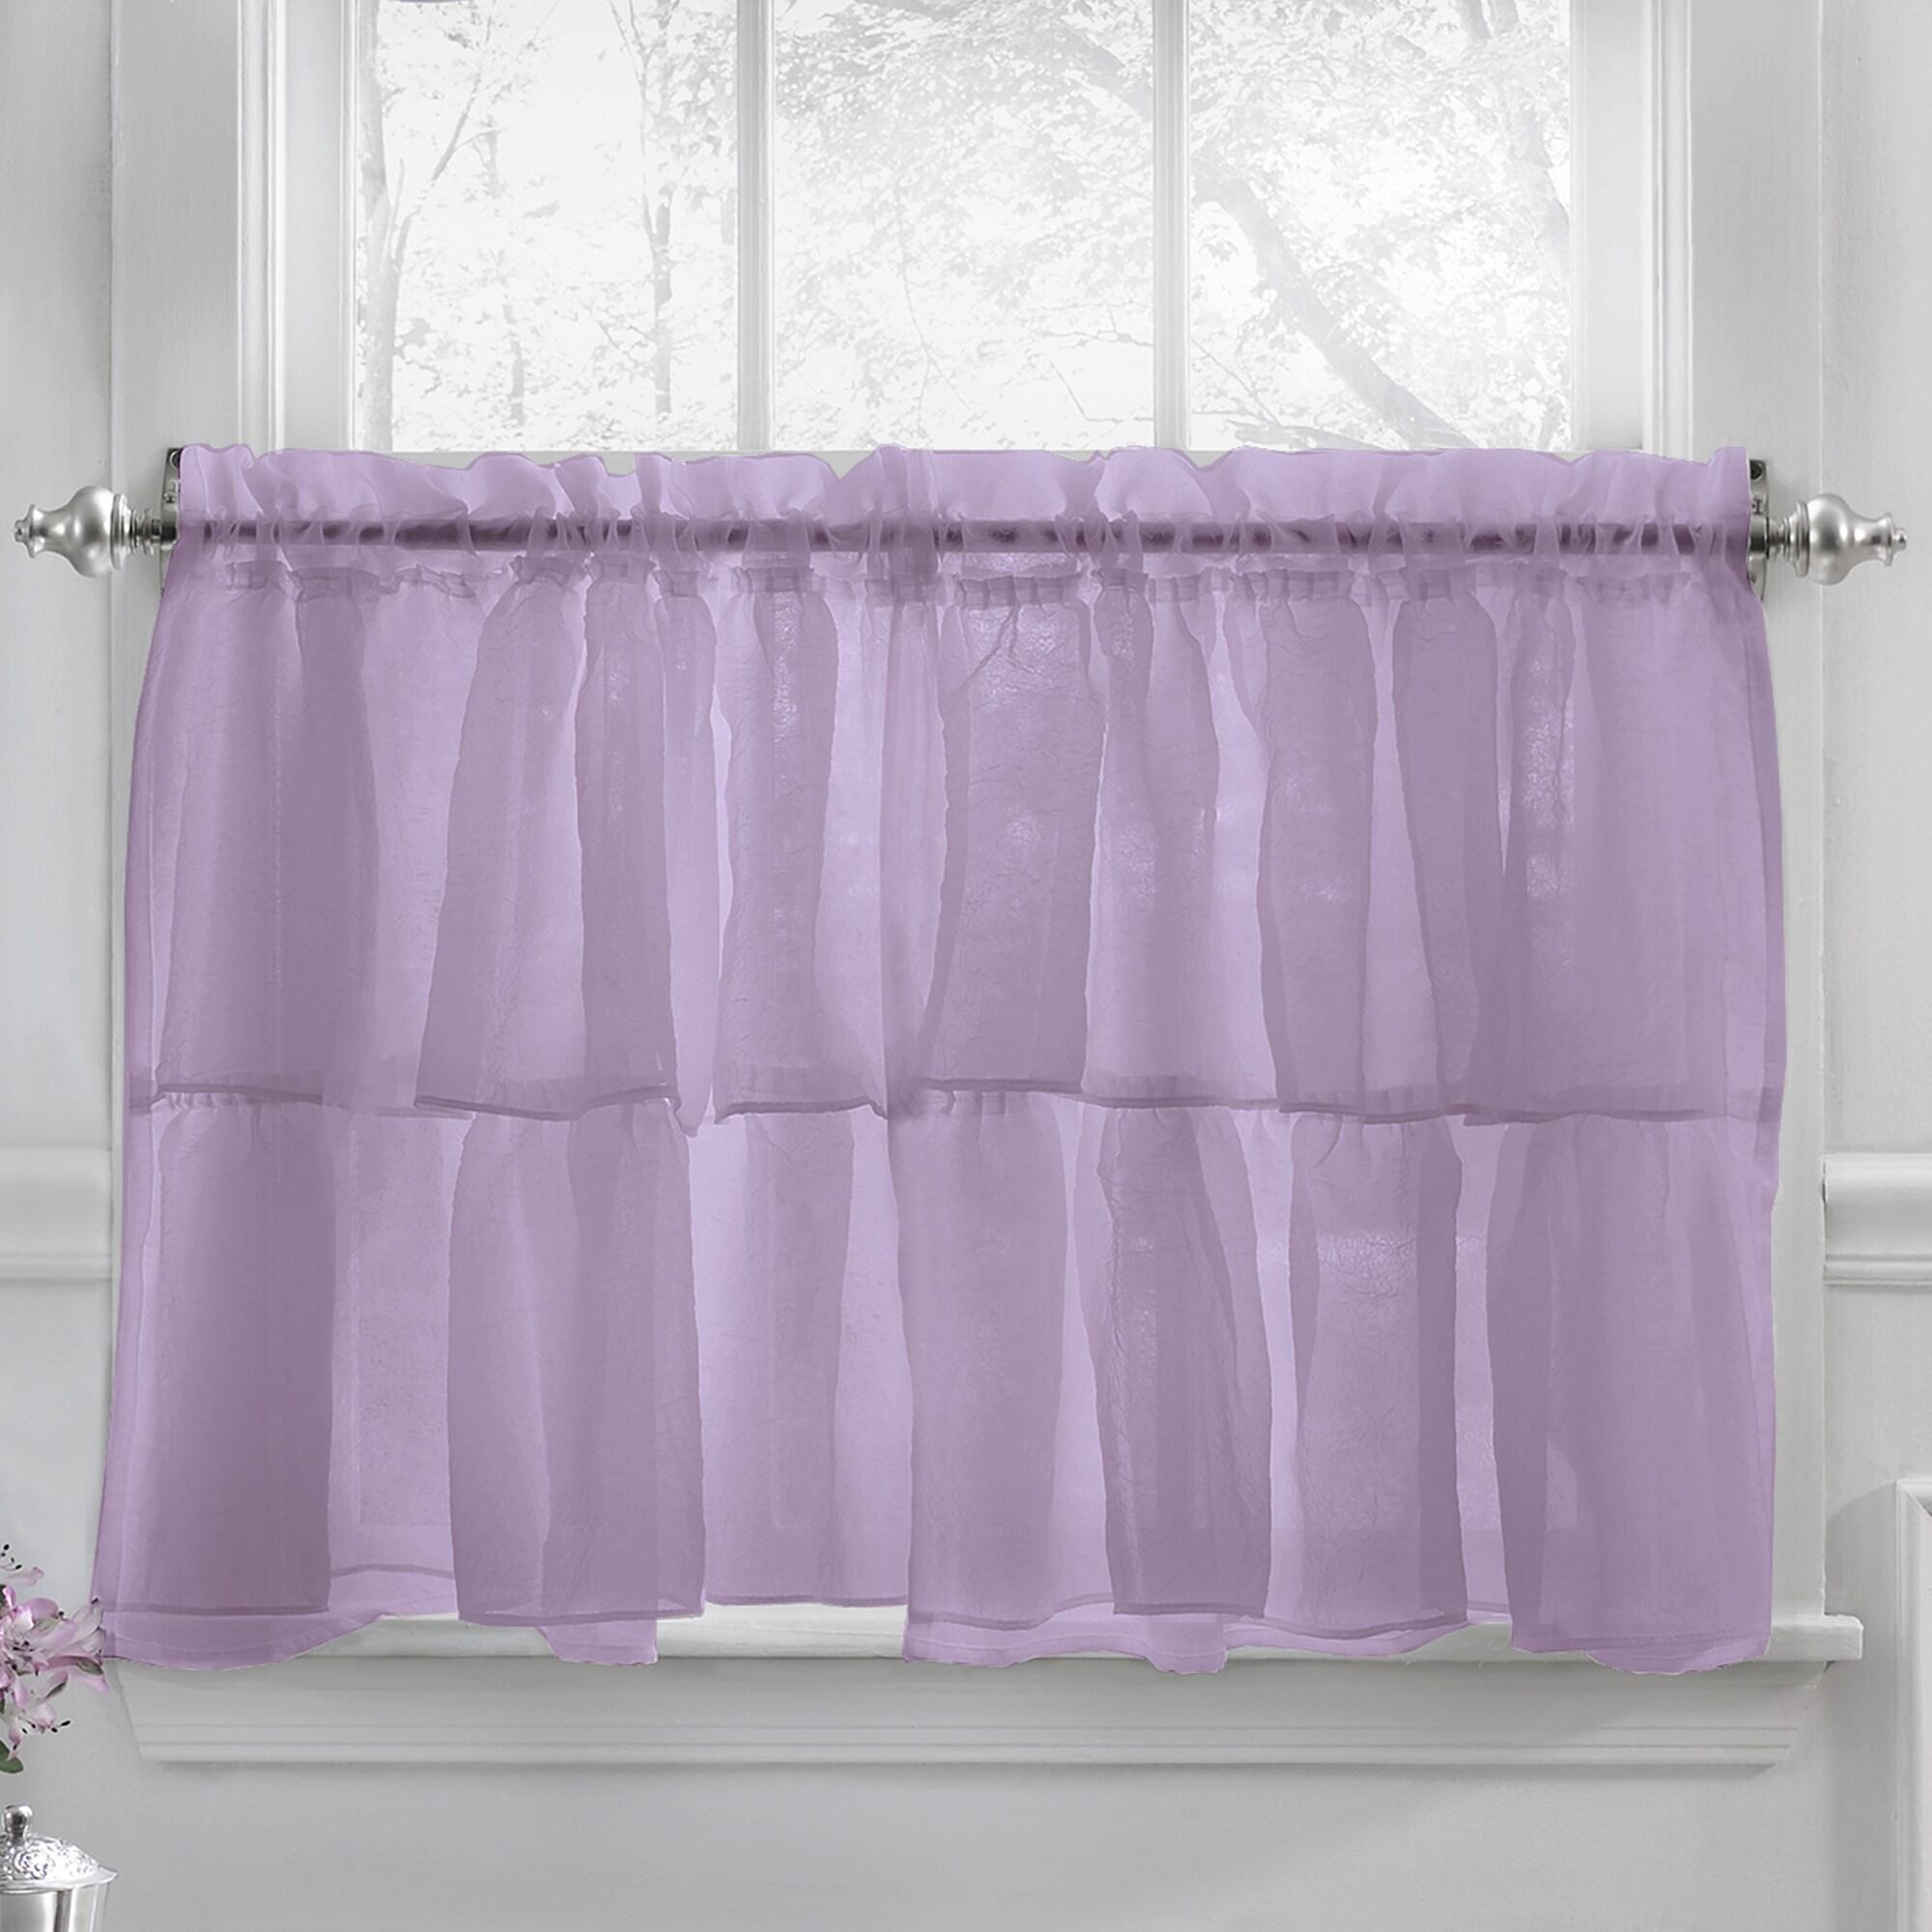 Elegant Crushed Voile Ruffle Blue/White/Pink/Purple/Beige Window ...